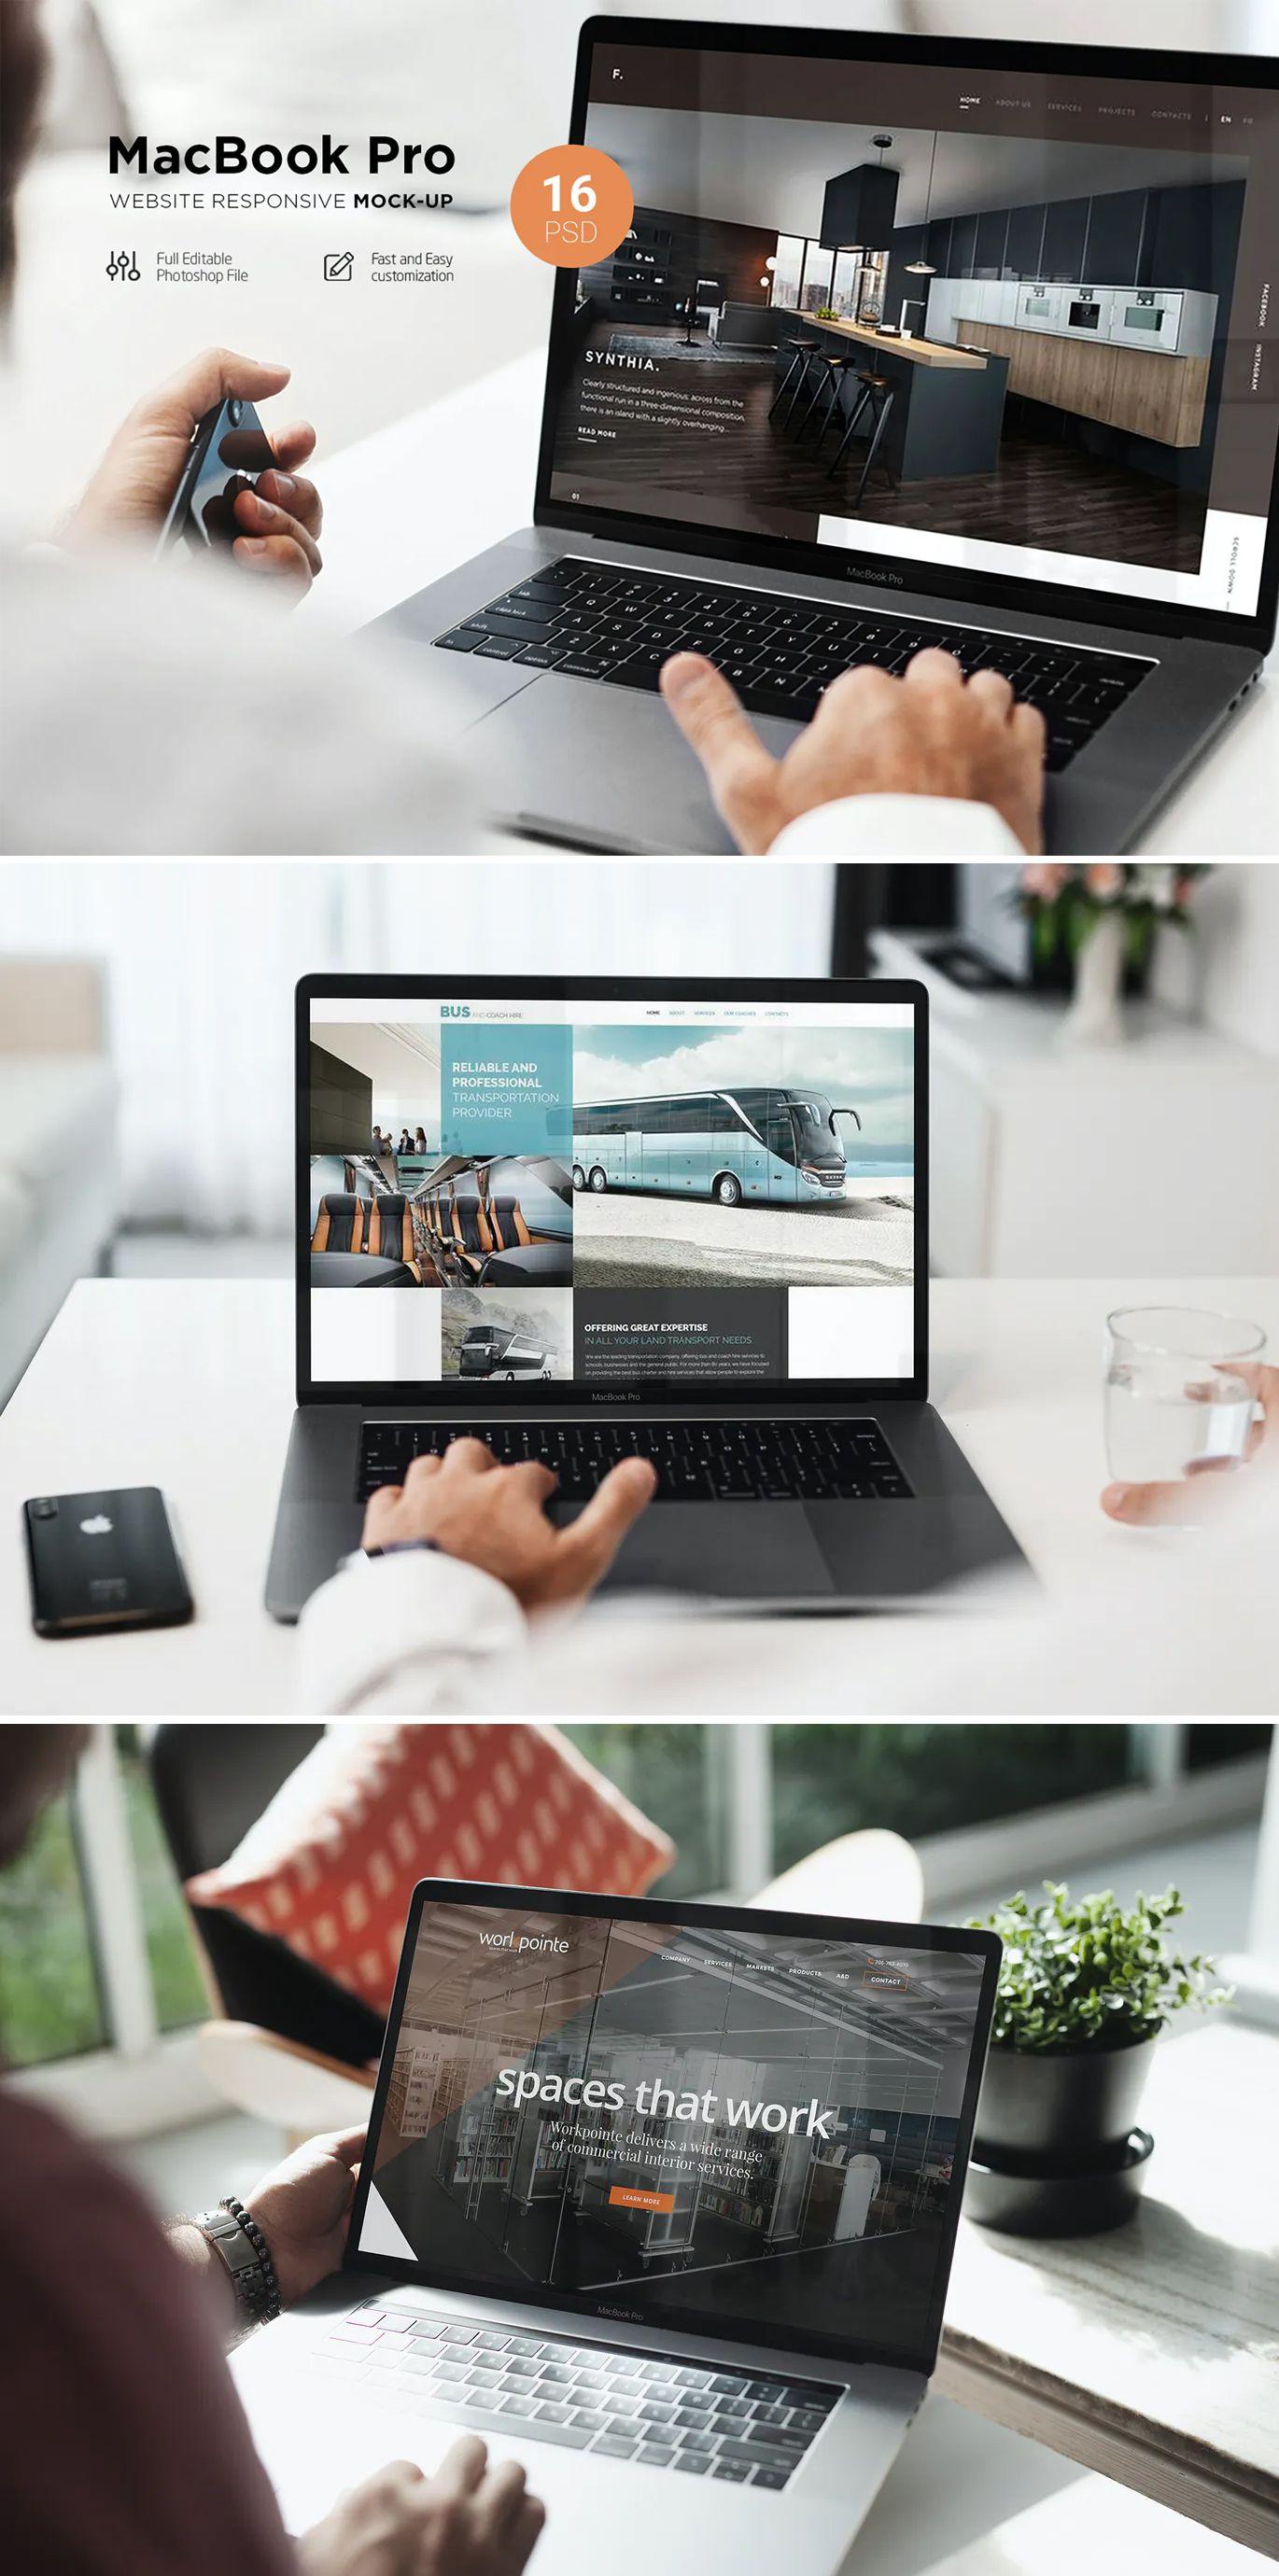 Macbook Pro Responsive Mockup